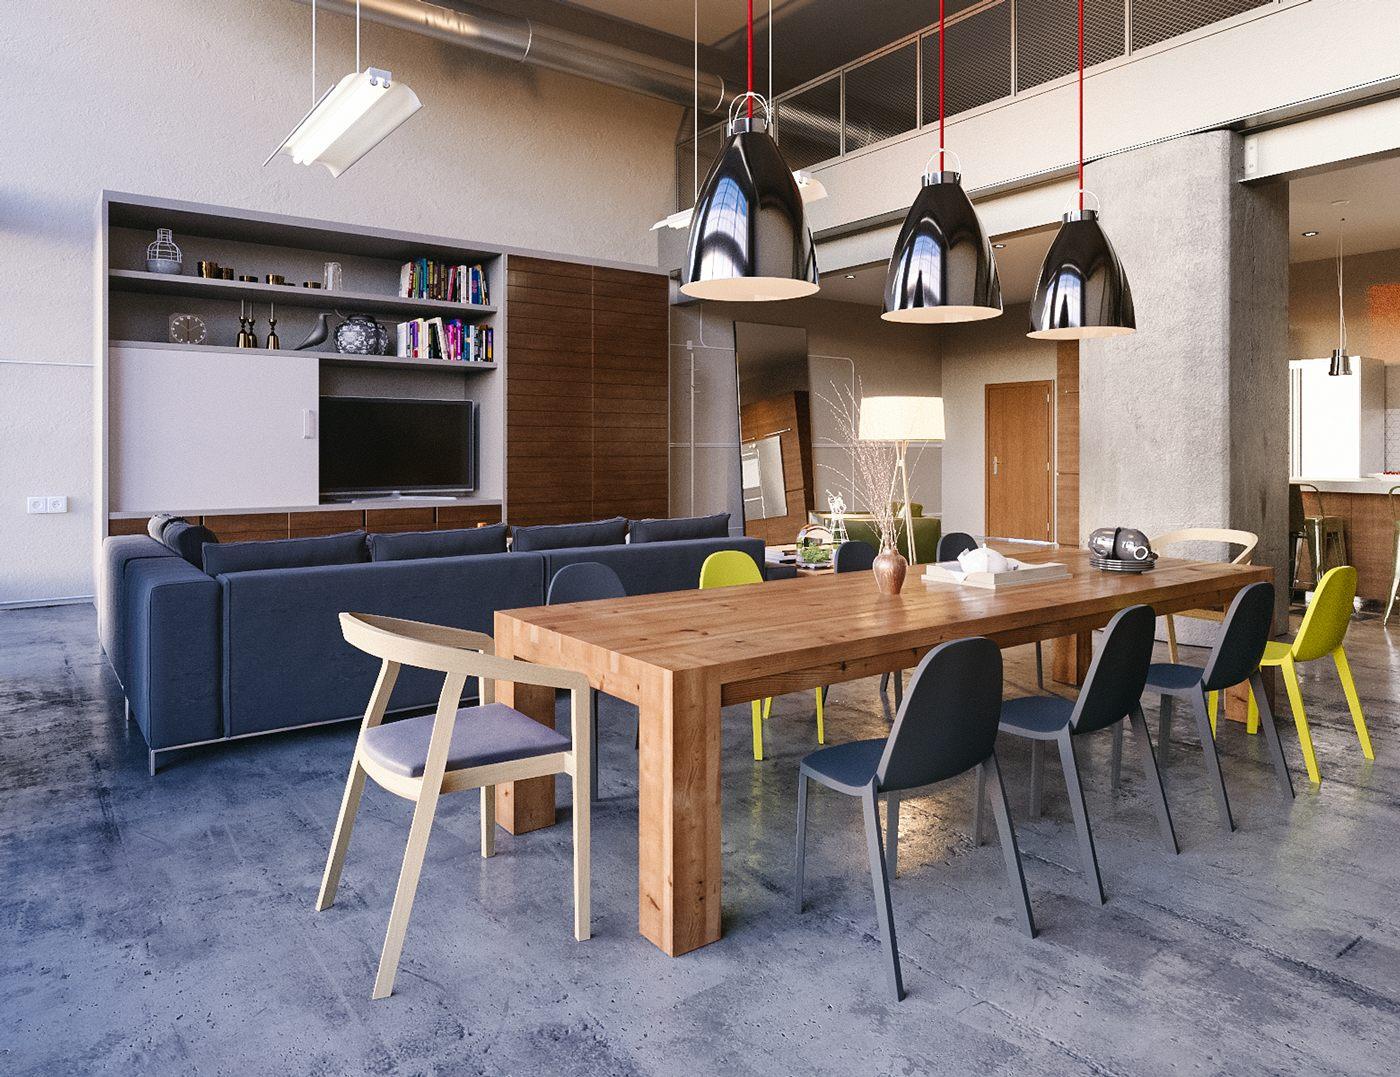 chic scandinavian dining room